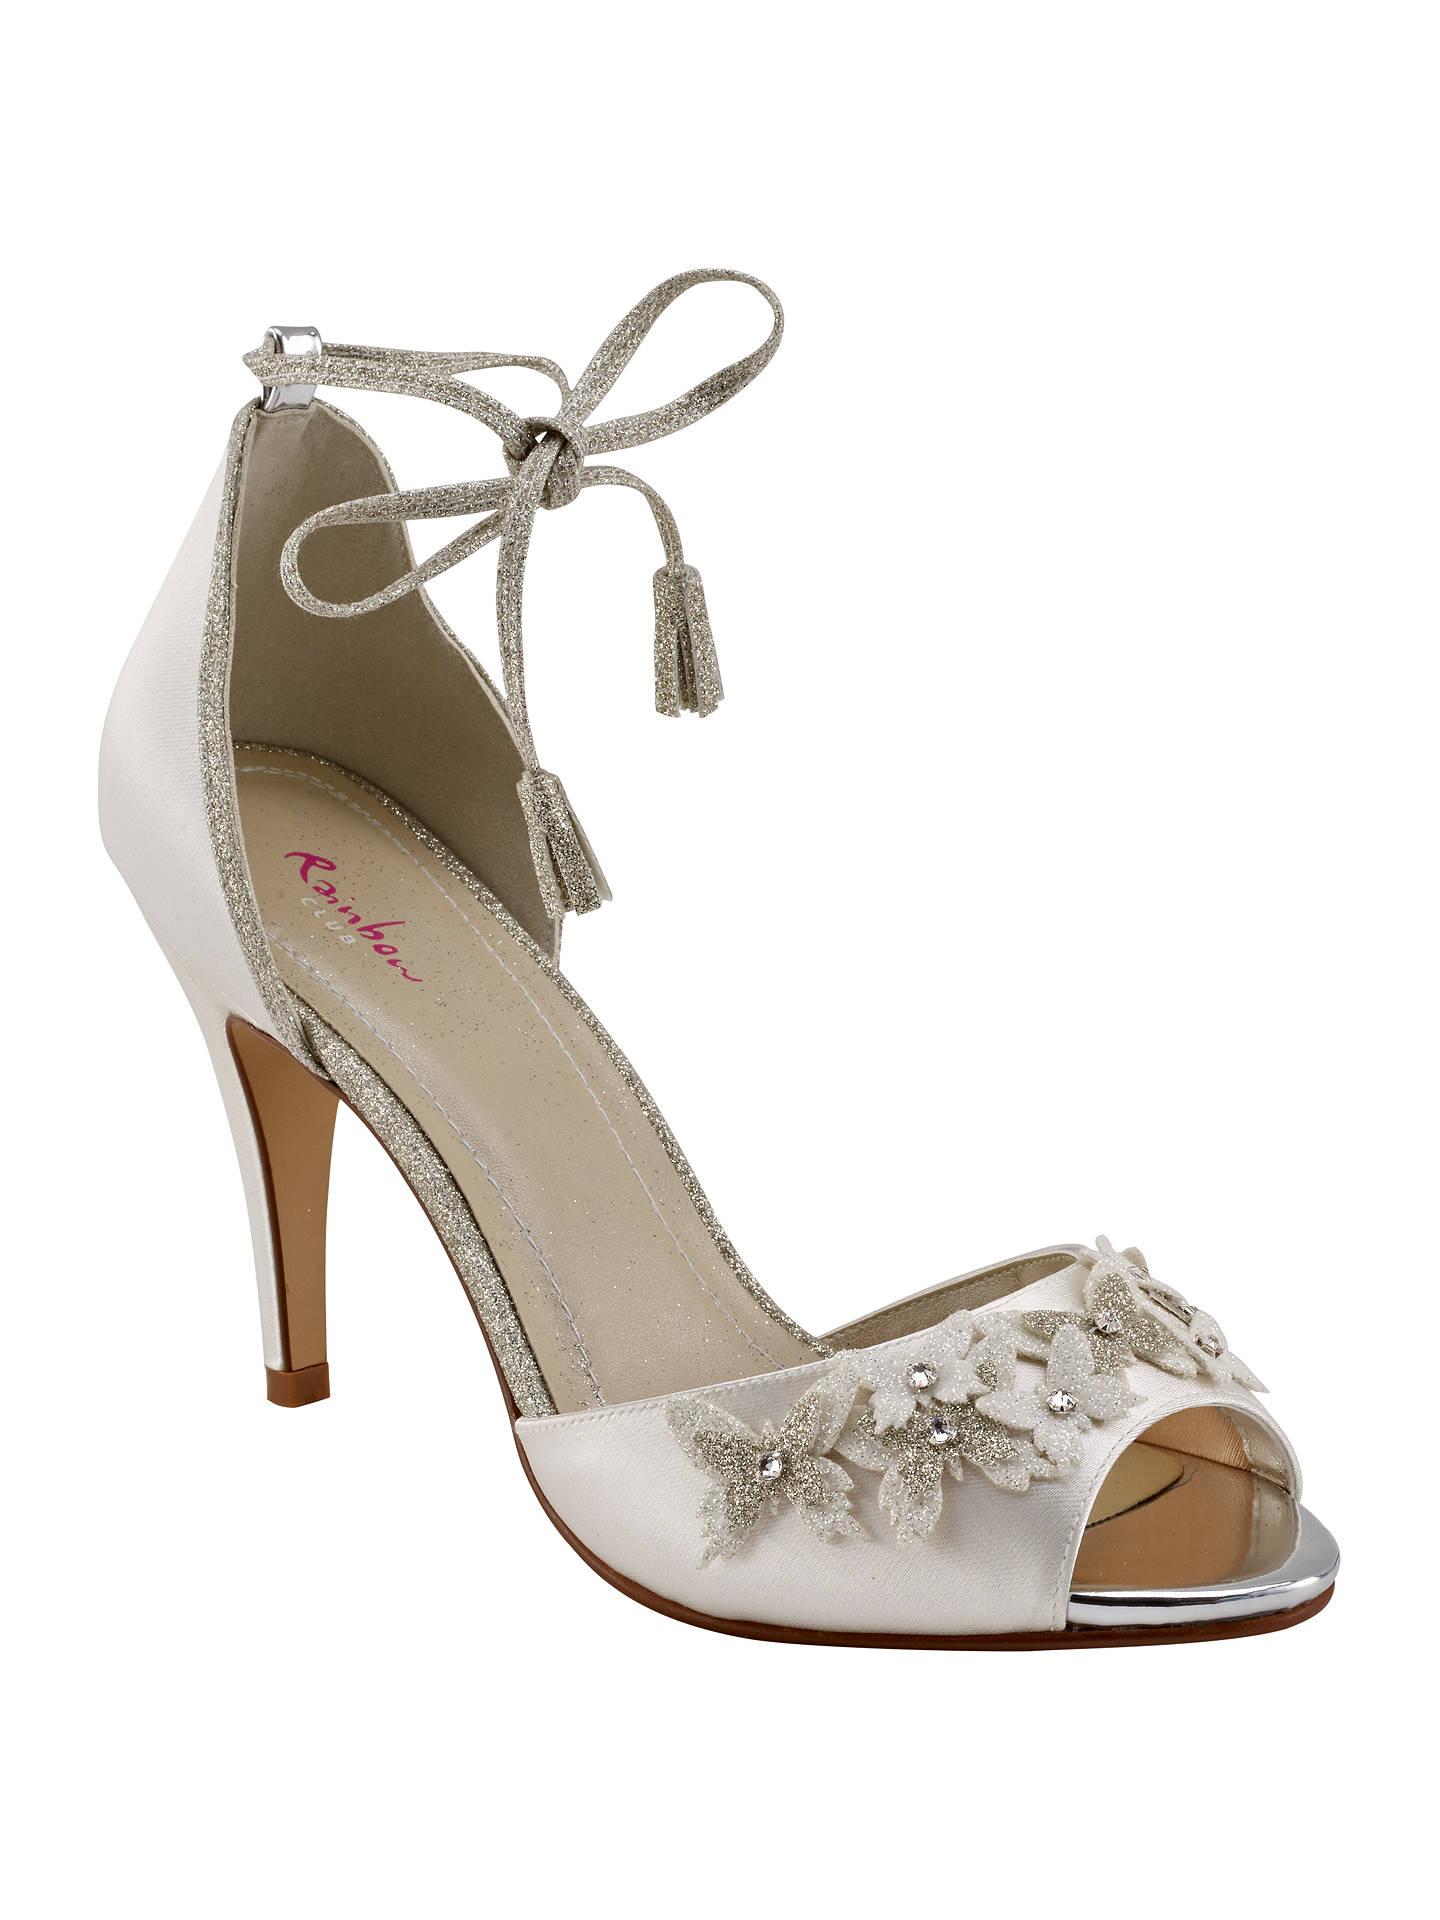 375bf5ebedd Buy Rainbow Club Zarah Peep Toe Sandals, Ivory, 3 Online at johnlewis.com  ...